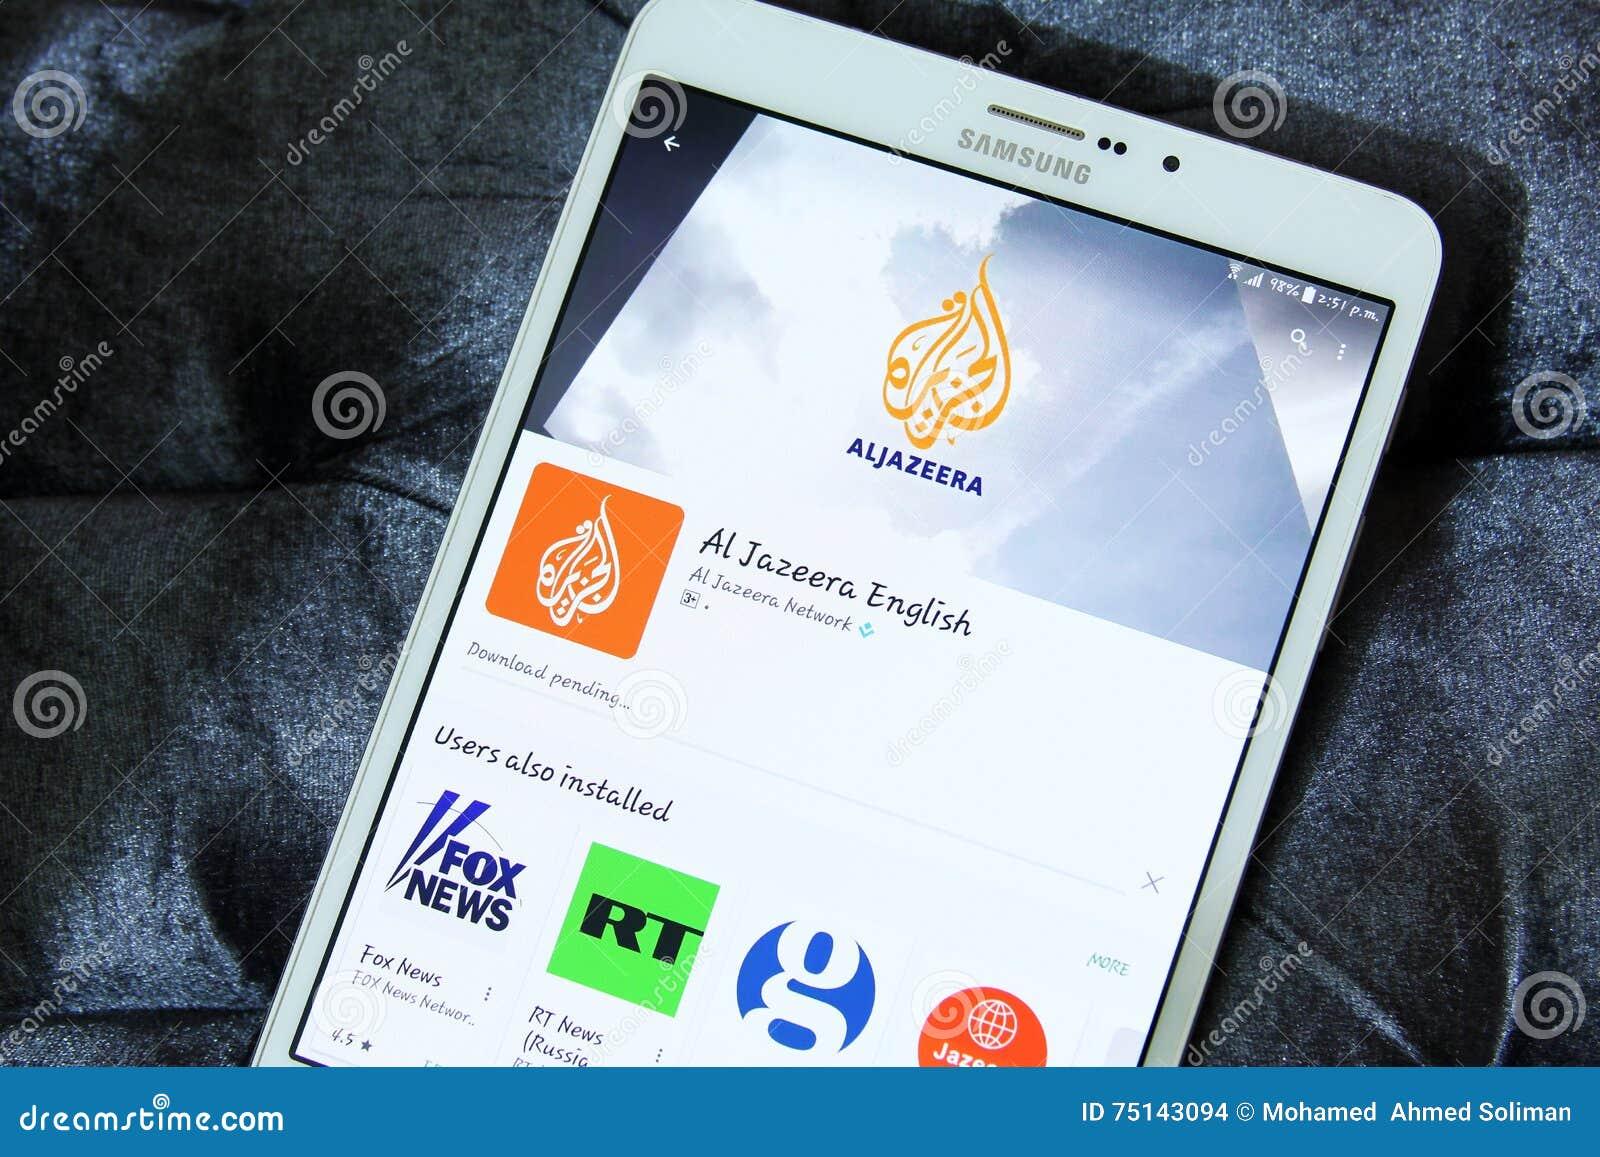 Aljazeera english app logo editorial stock image  Image of